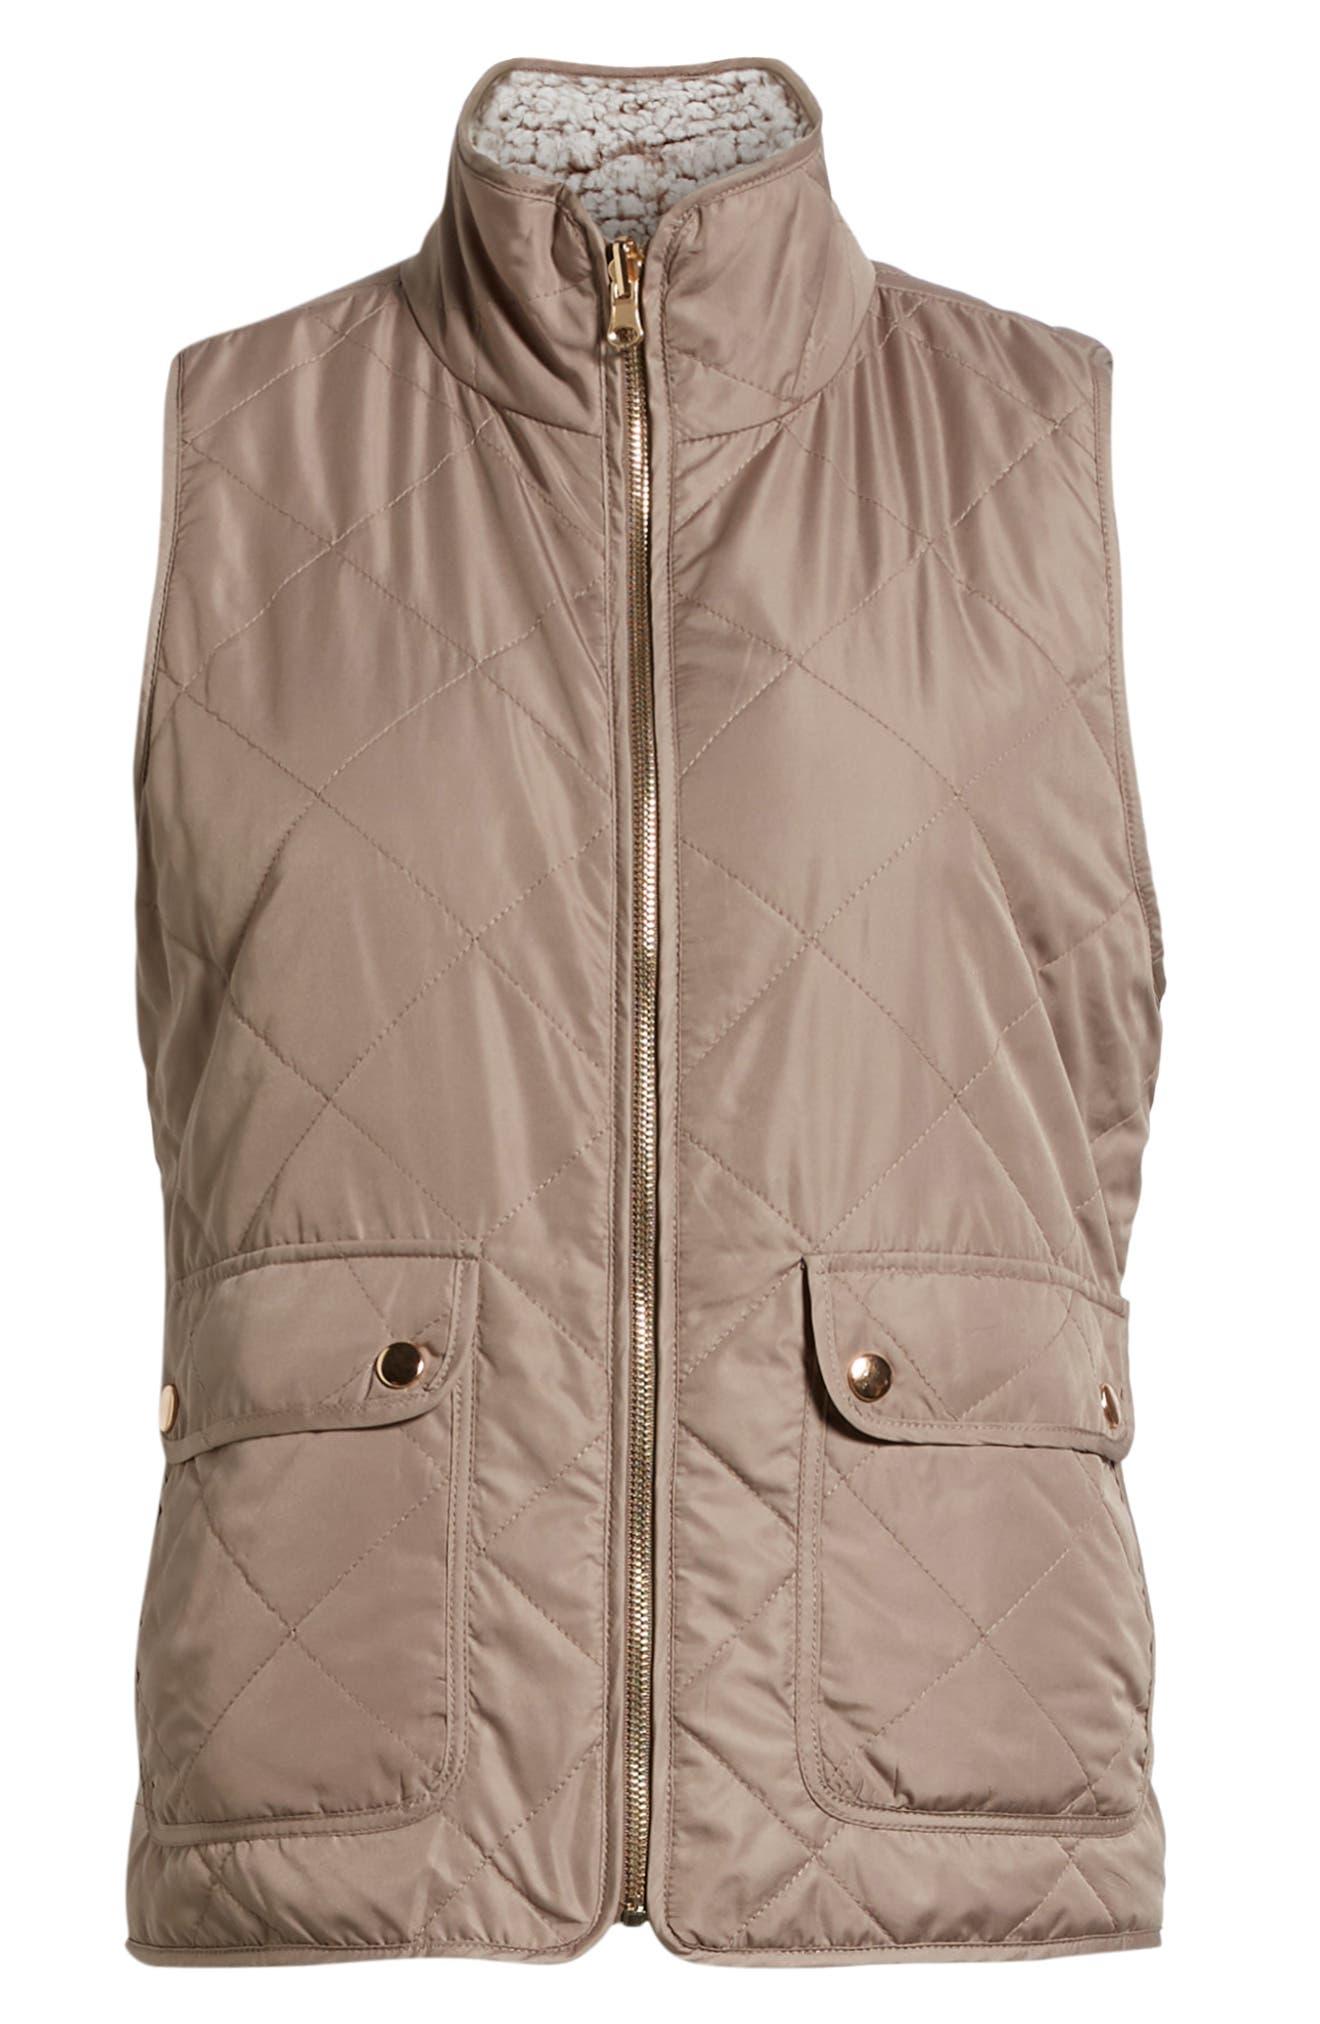 Reversible Fleece Lined Quilted Vest,                             Alternate thumbnail 7, color,                             MUSHROOM